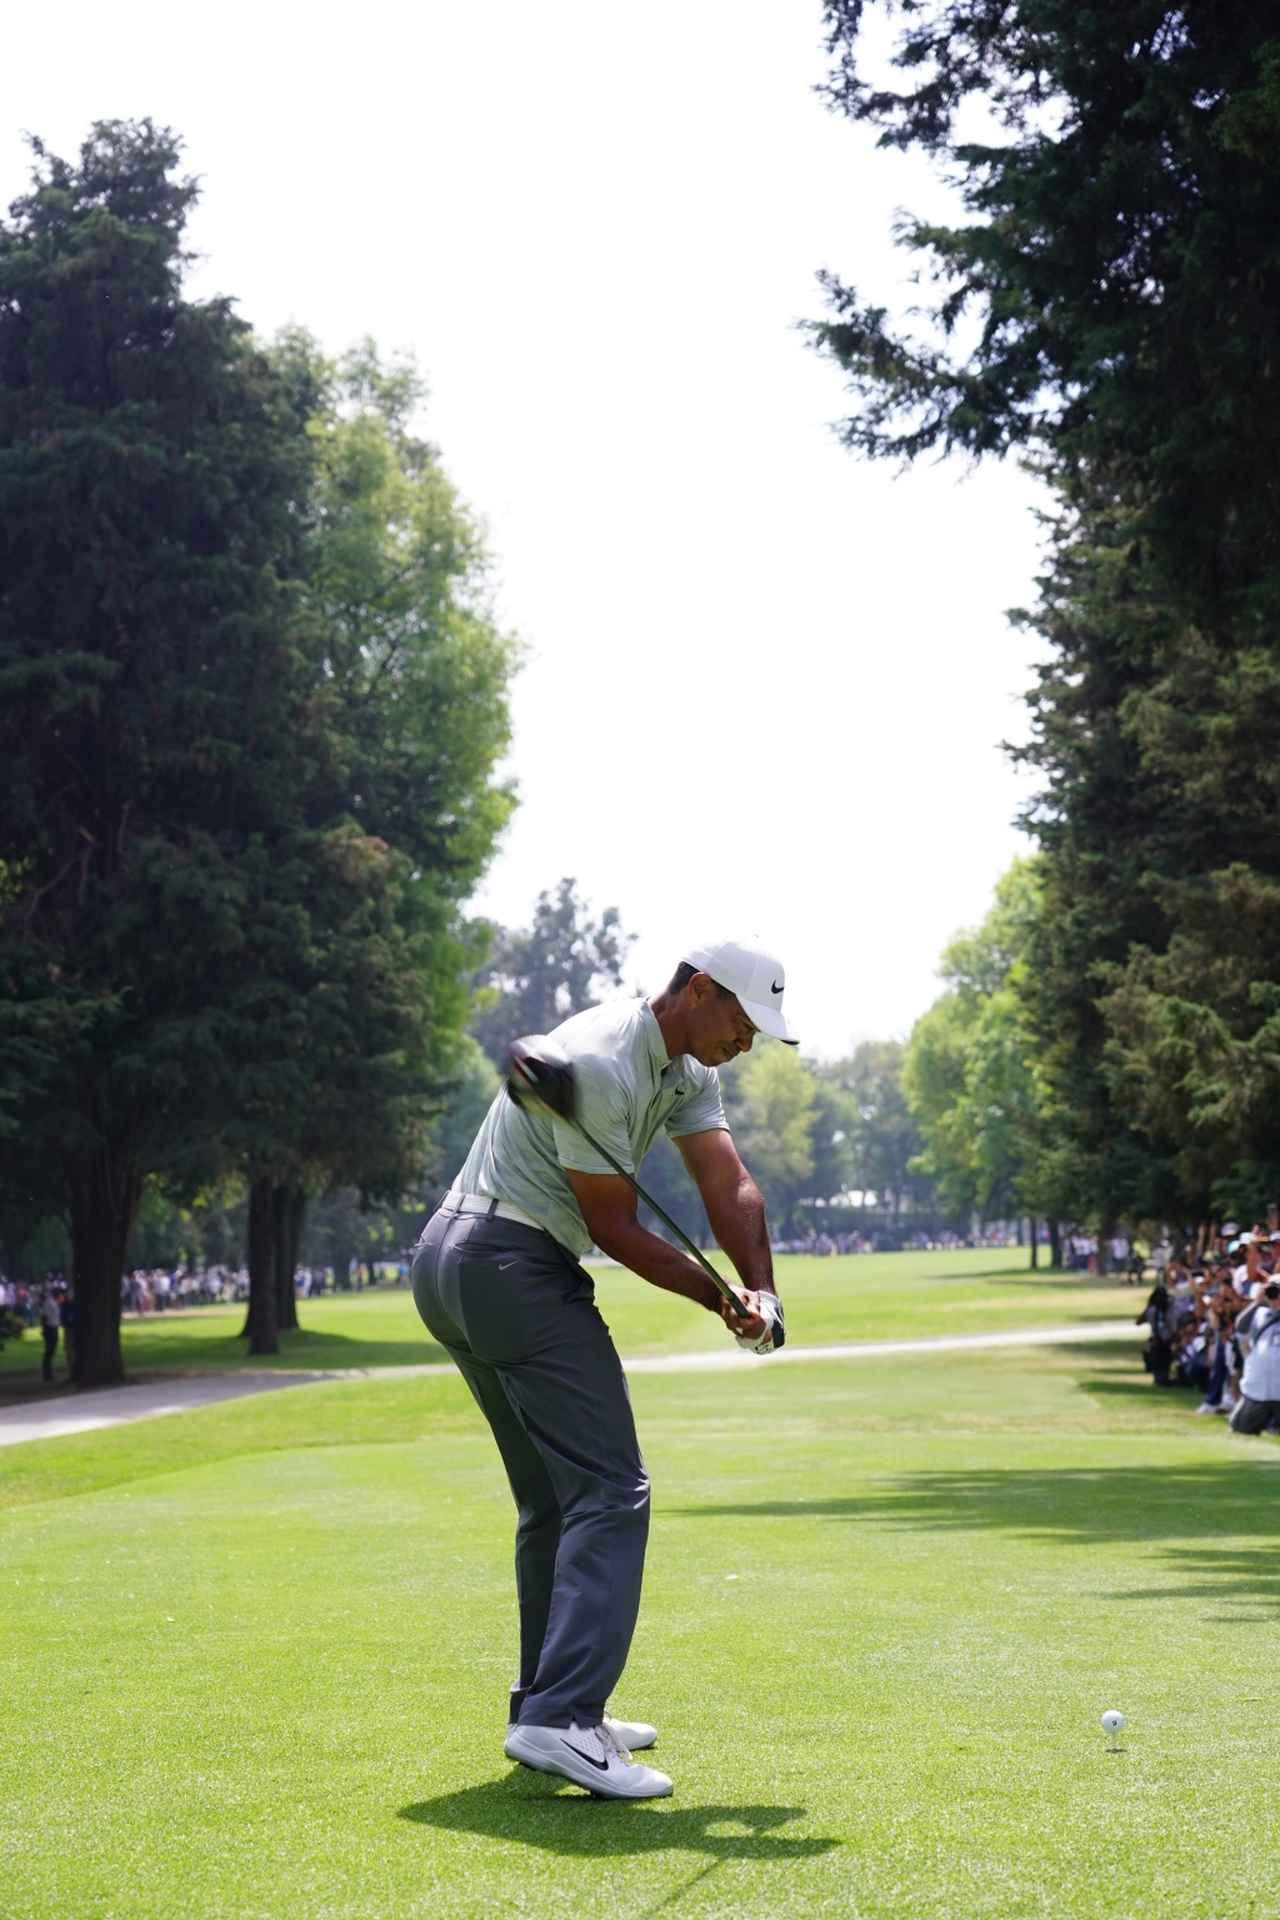 Images : 8番目の画像 - タイガー・ウッズのドライバー連続写真 - みんなのゴルフダイジェスト